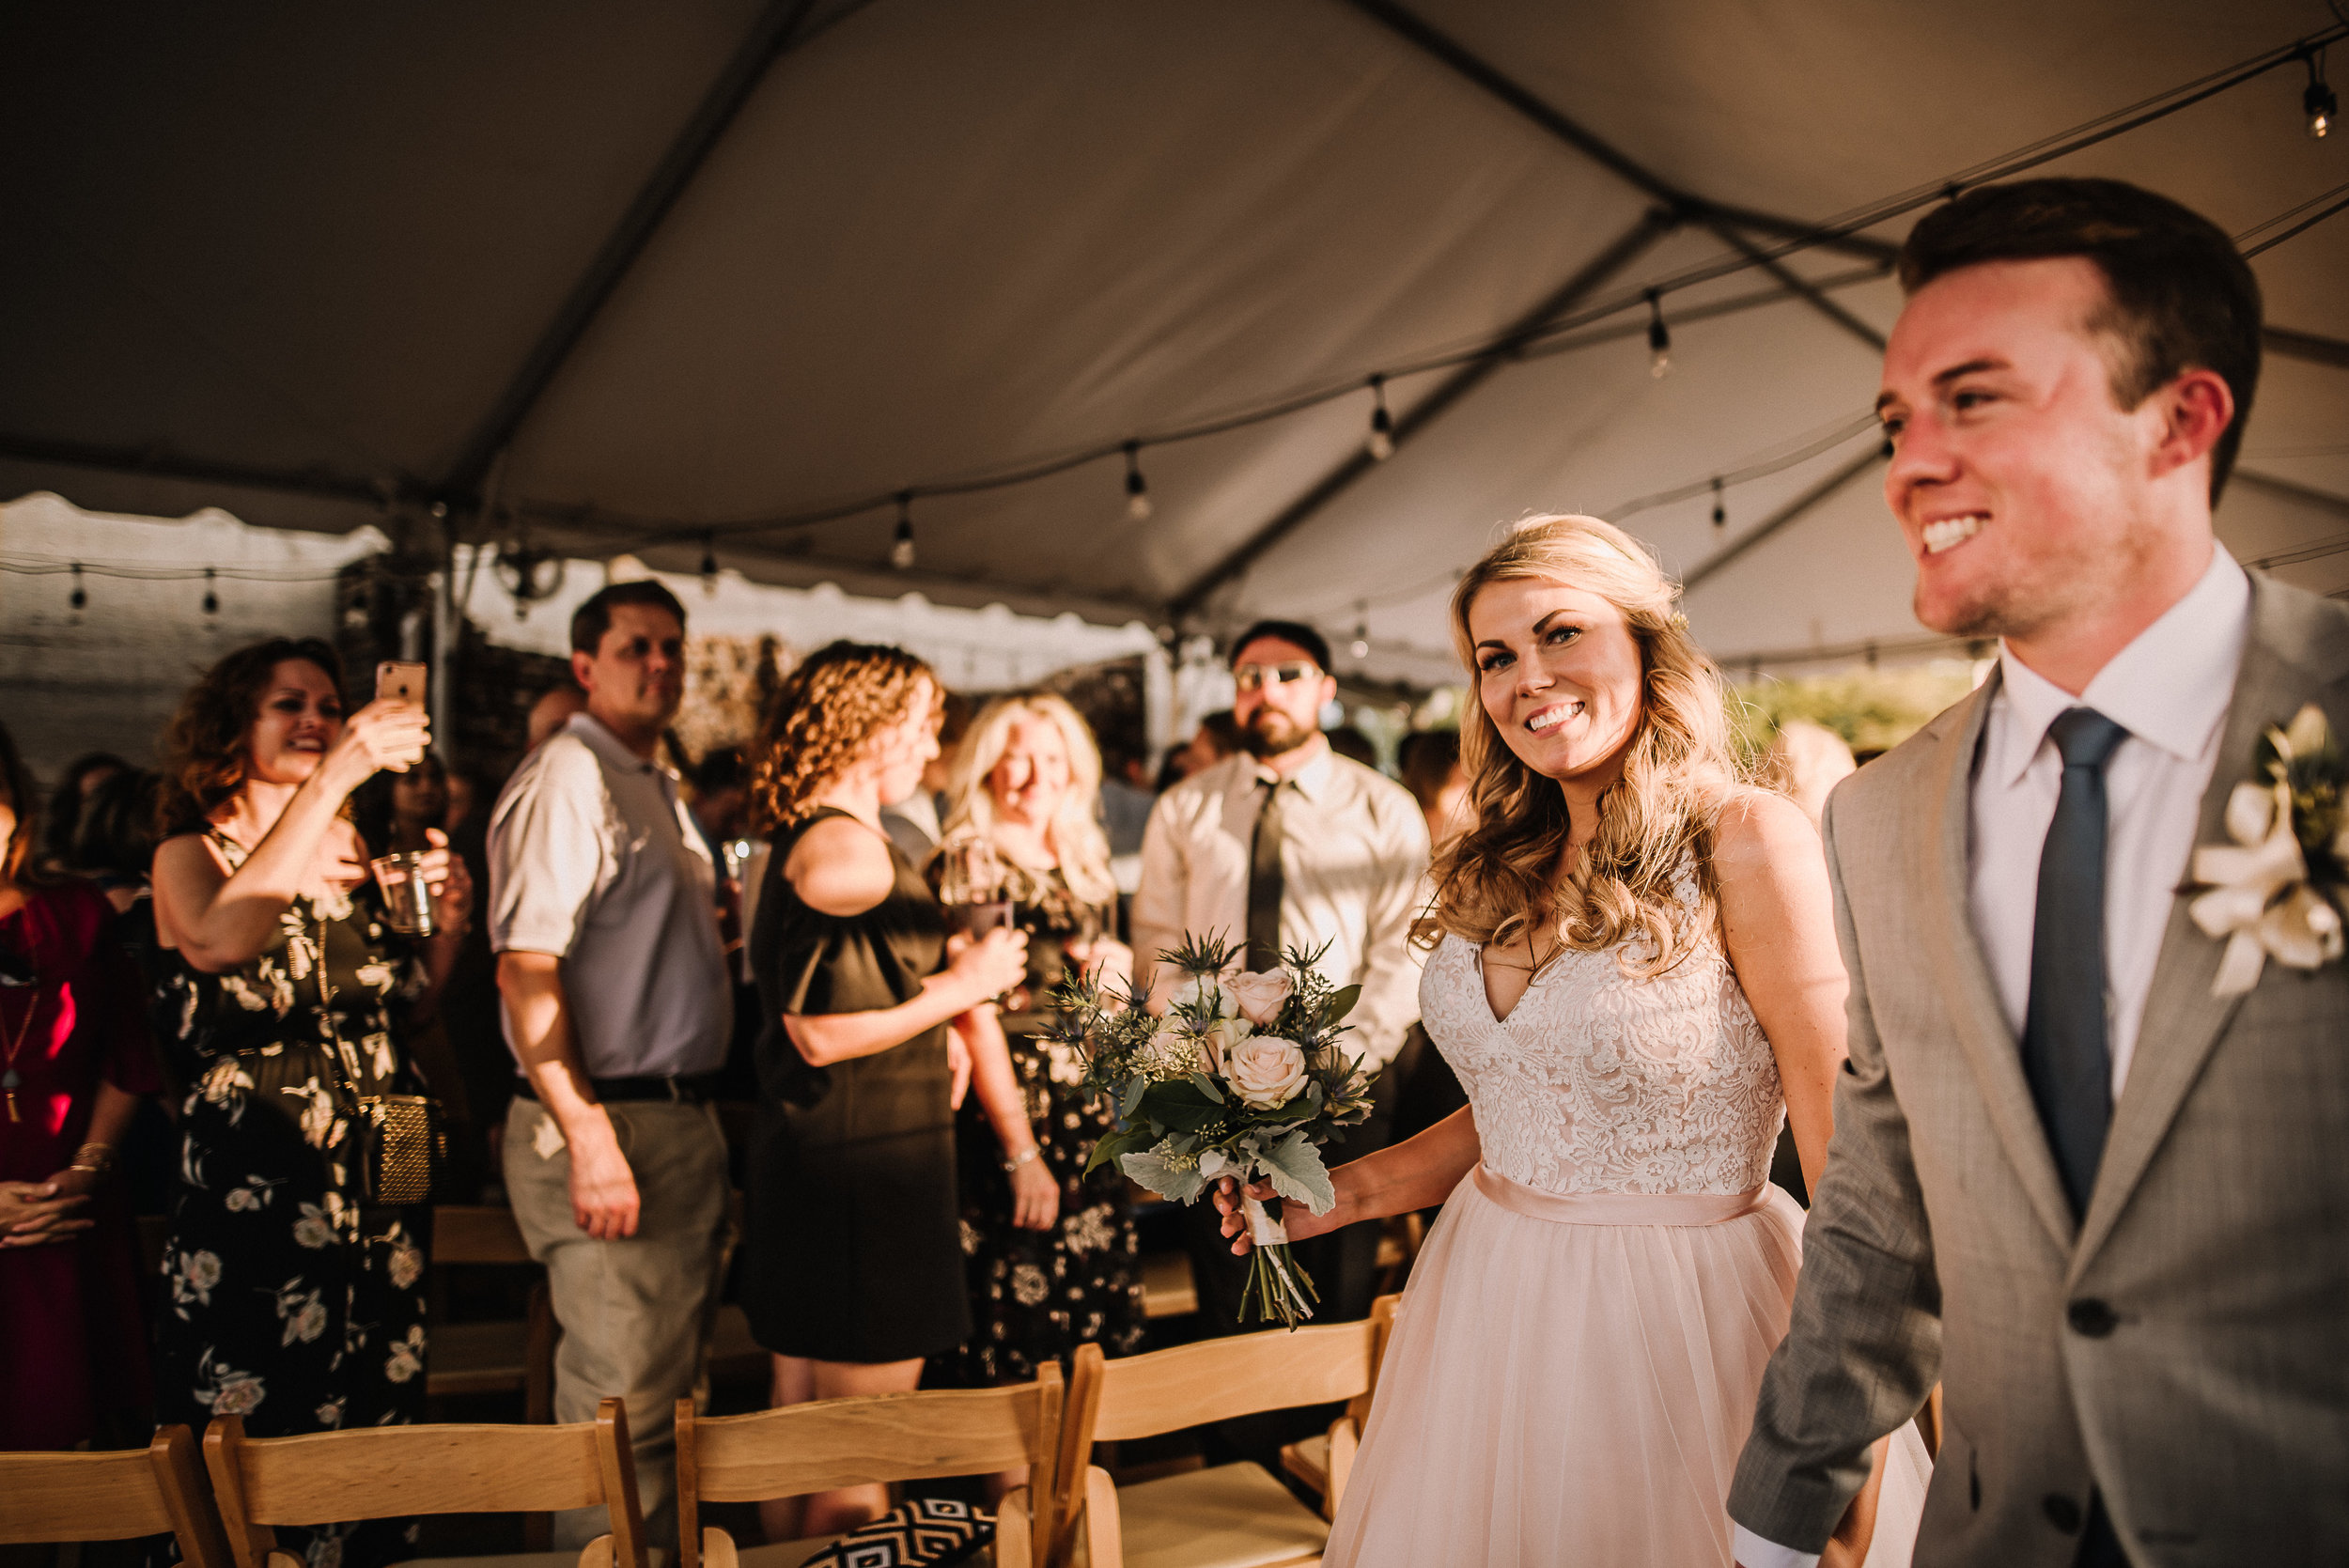 Pearson-Wiseacre-Wedding_Ashley-Benham-Photography (247 of 633).jpg